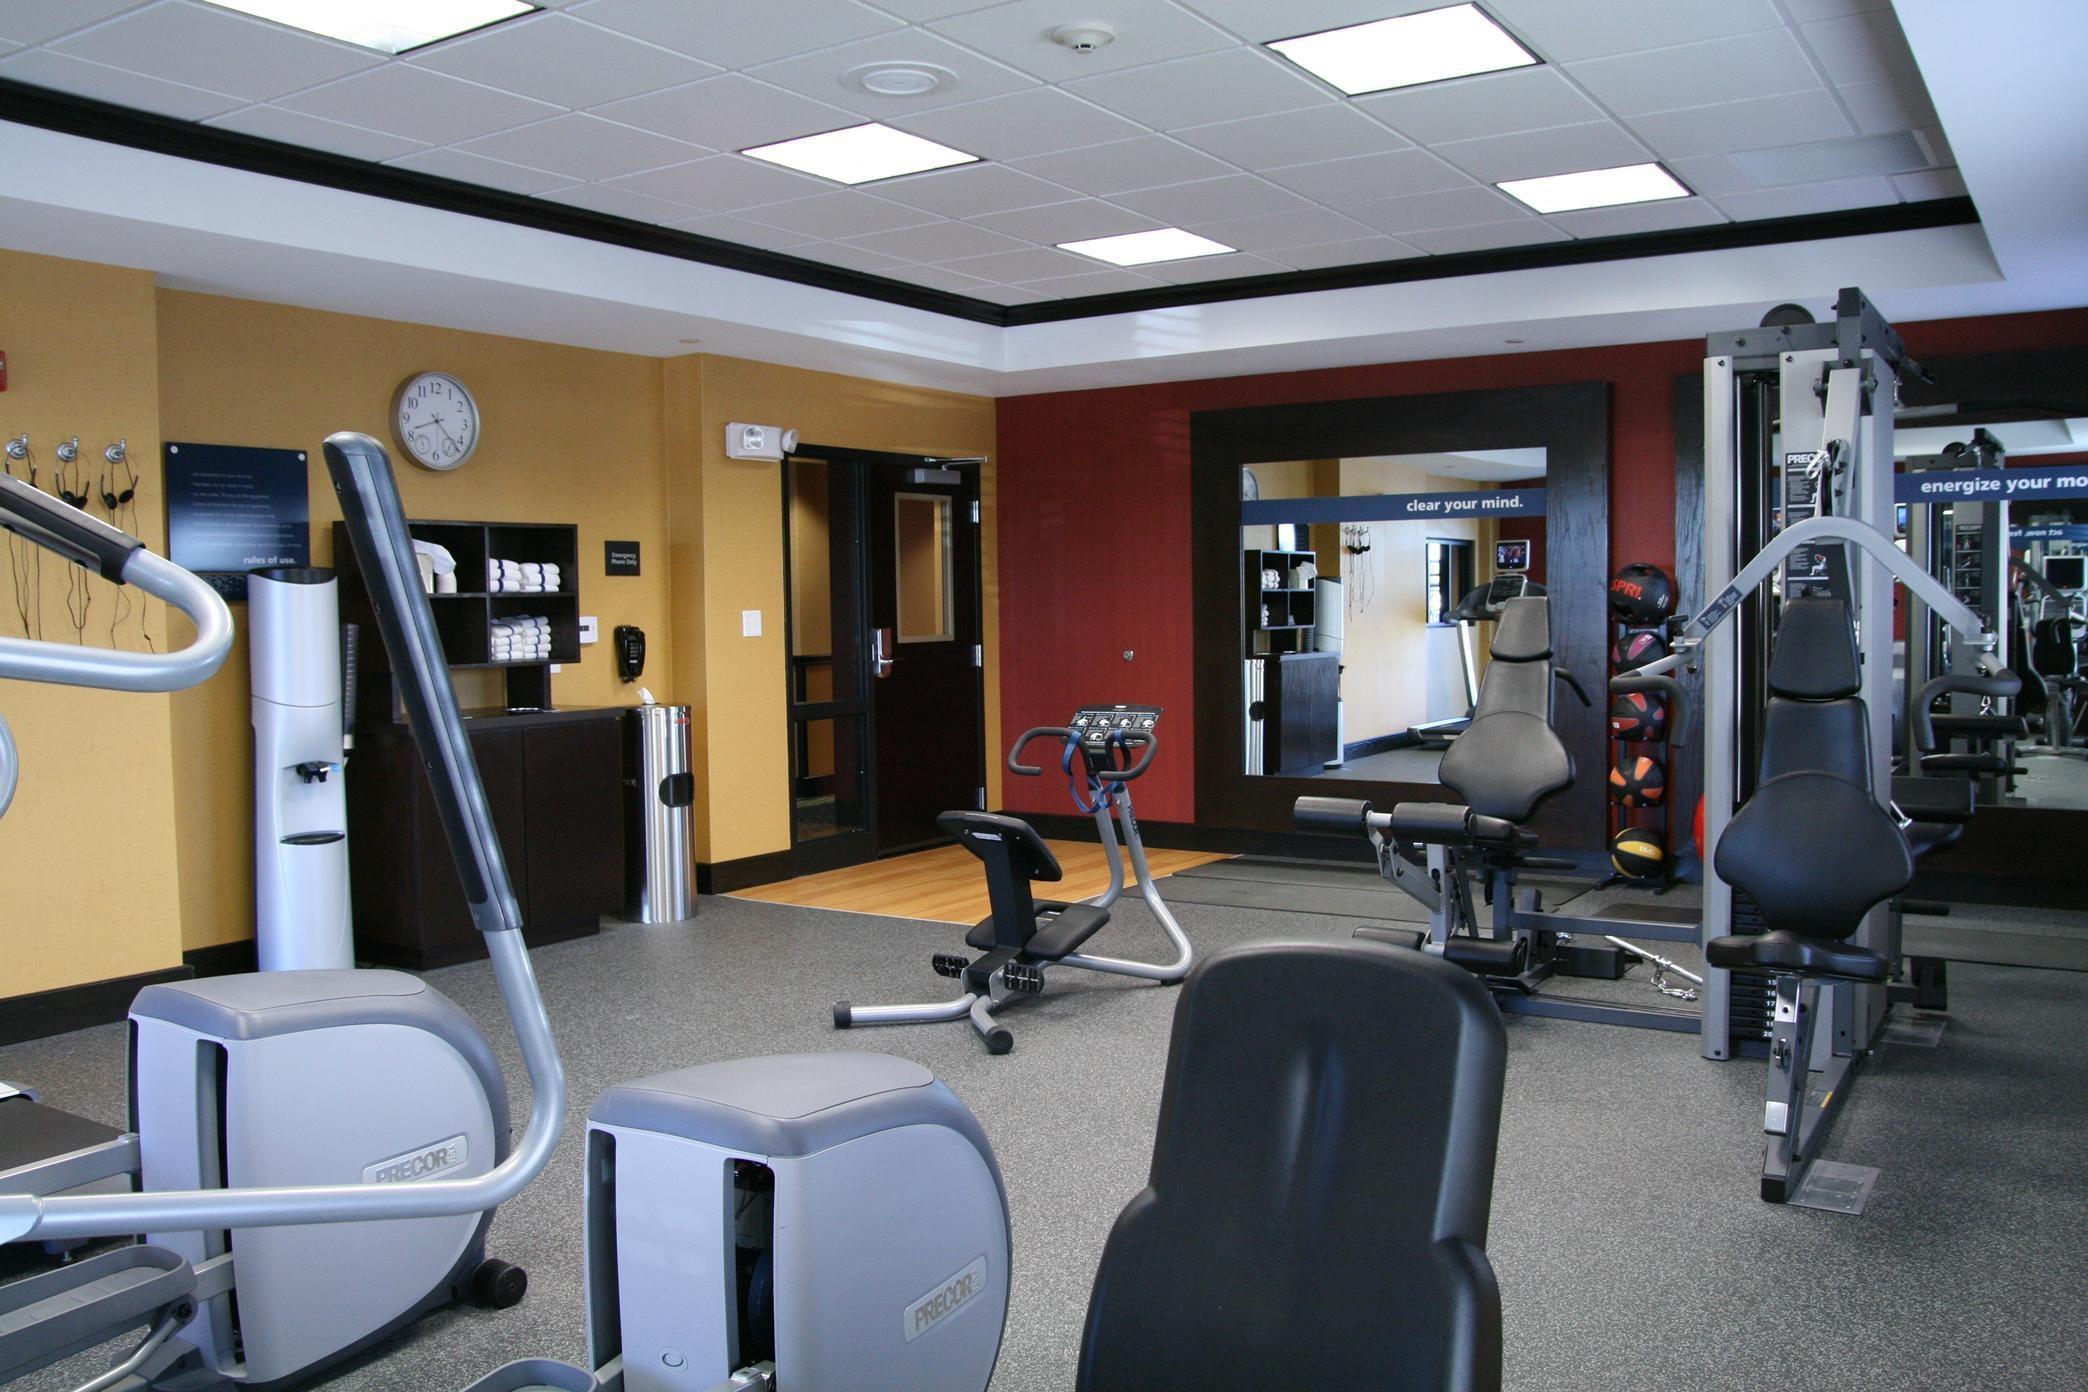 Hampton Inn & Suites Dallas/Lewisville-Vista Ridge Mall, TX image 13